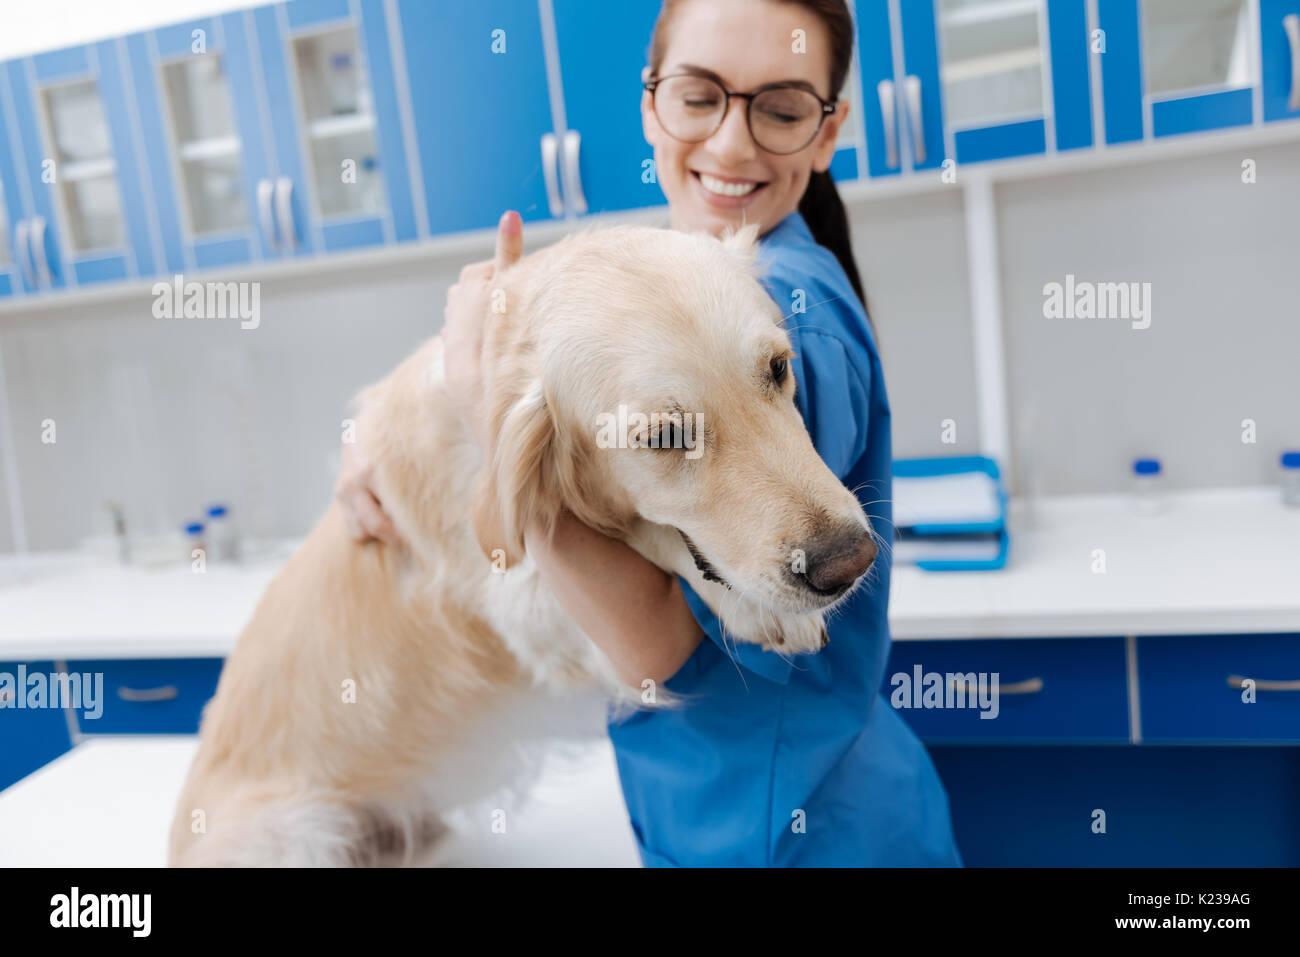 Veterinär erfreut die Fügsamen Hund Stockbild